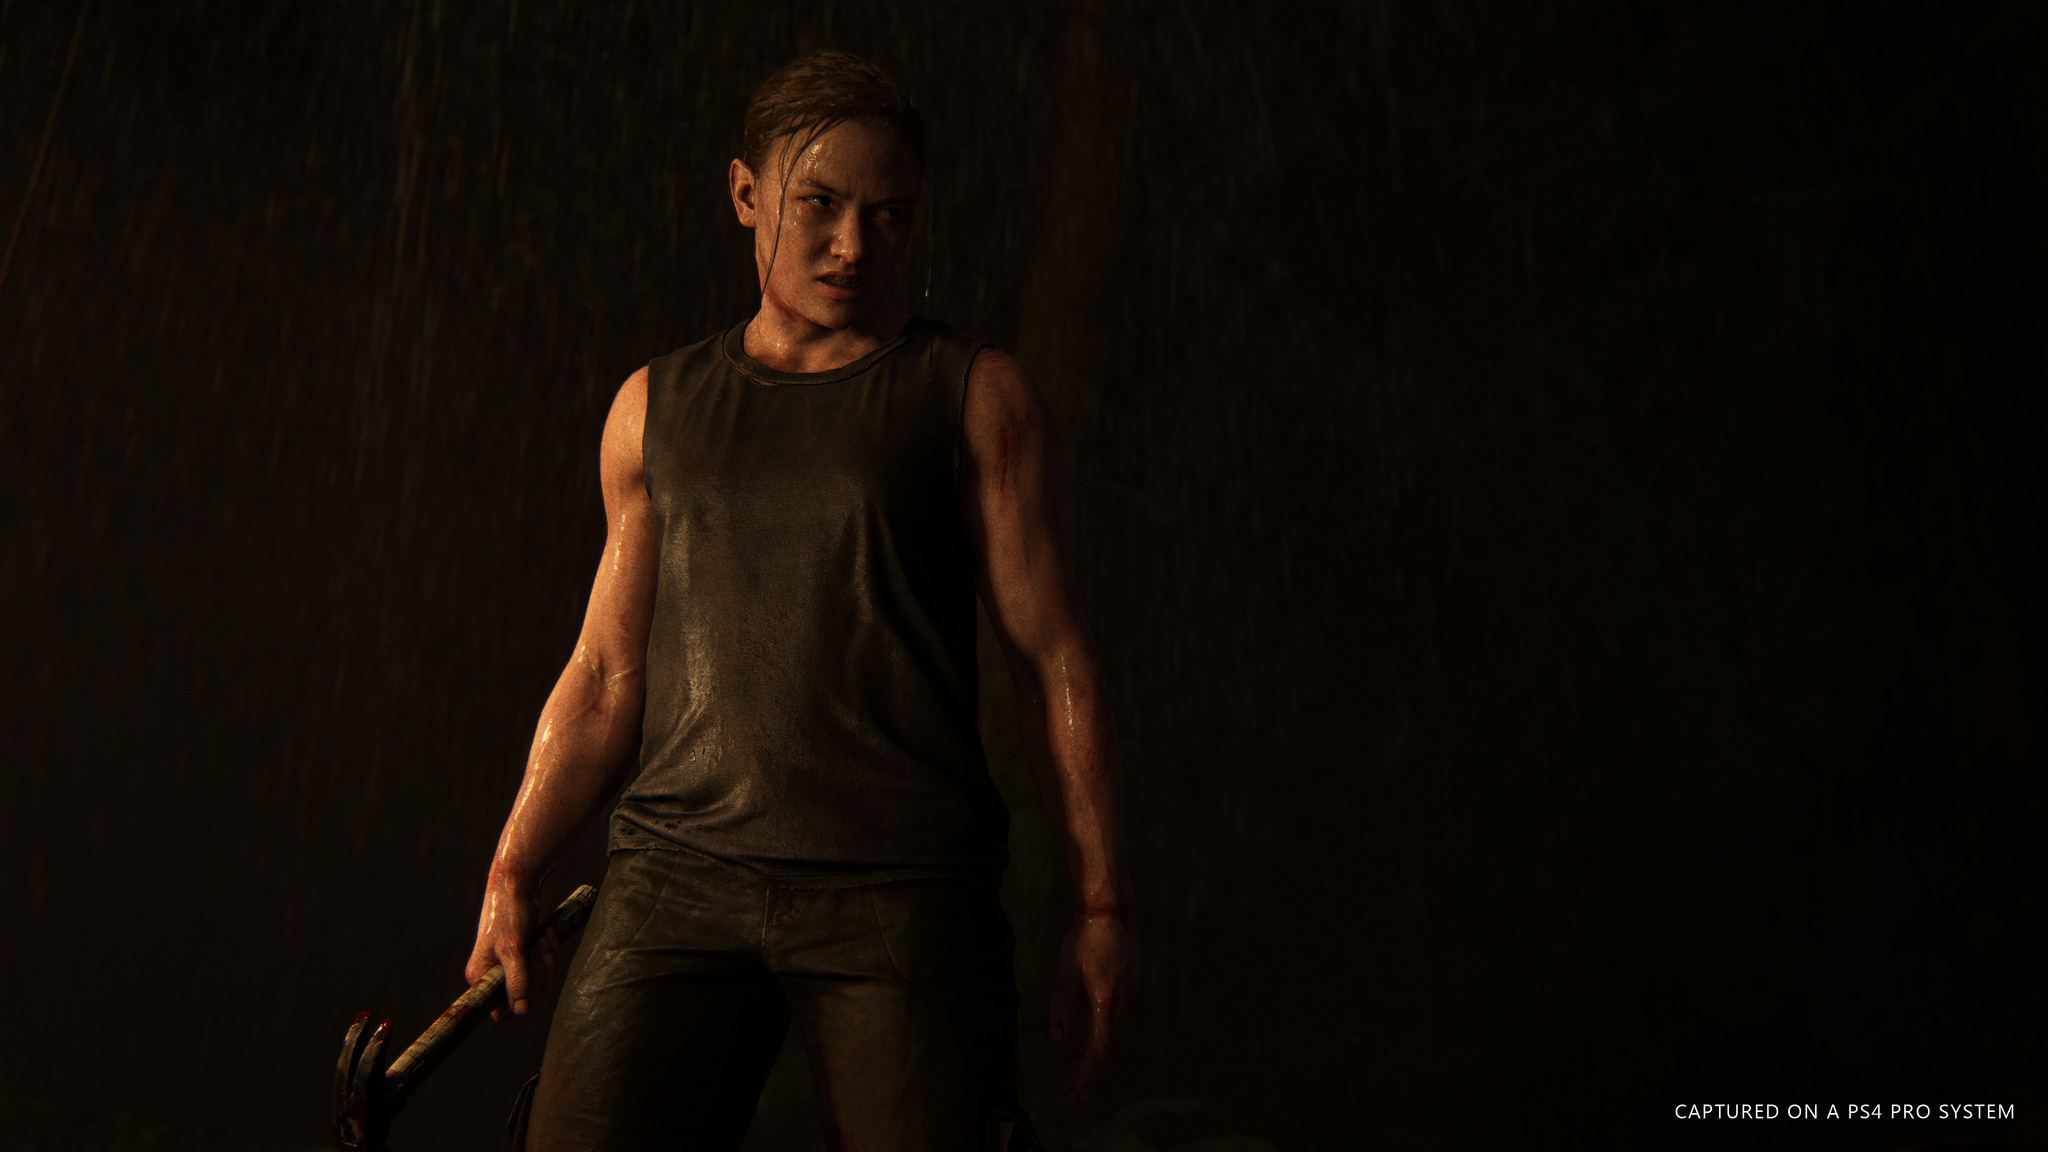 「The Last of Us Part II」の画像検索結果